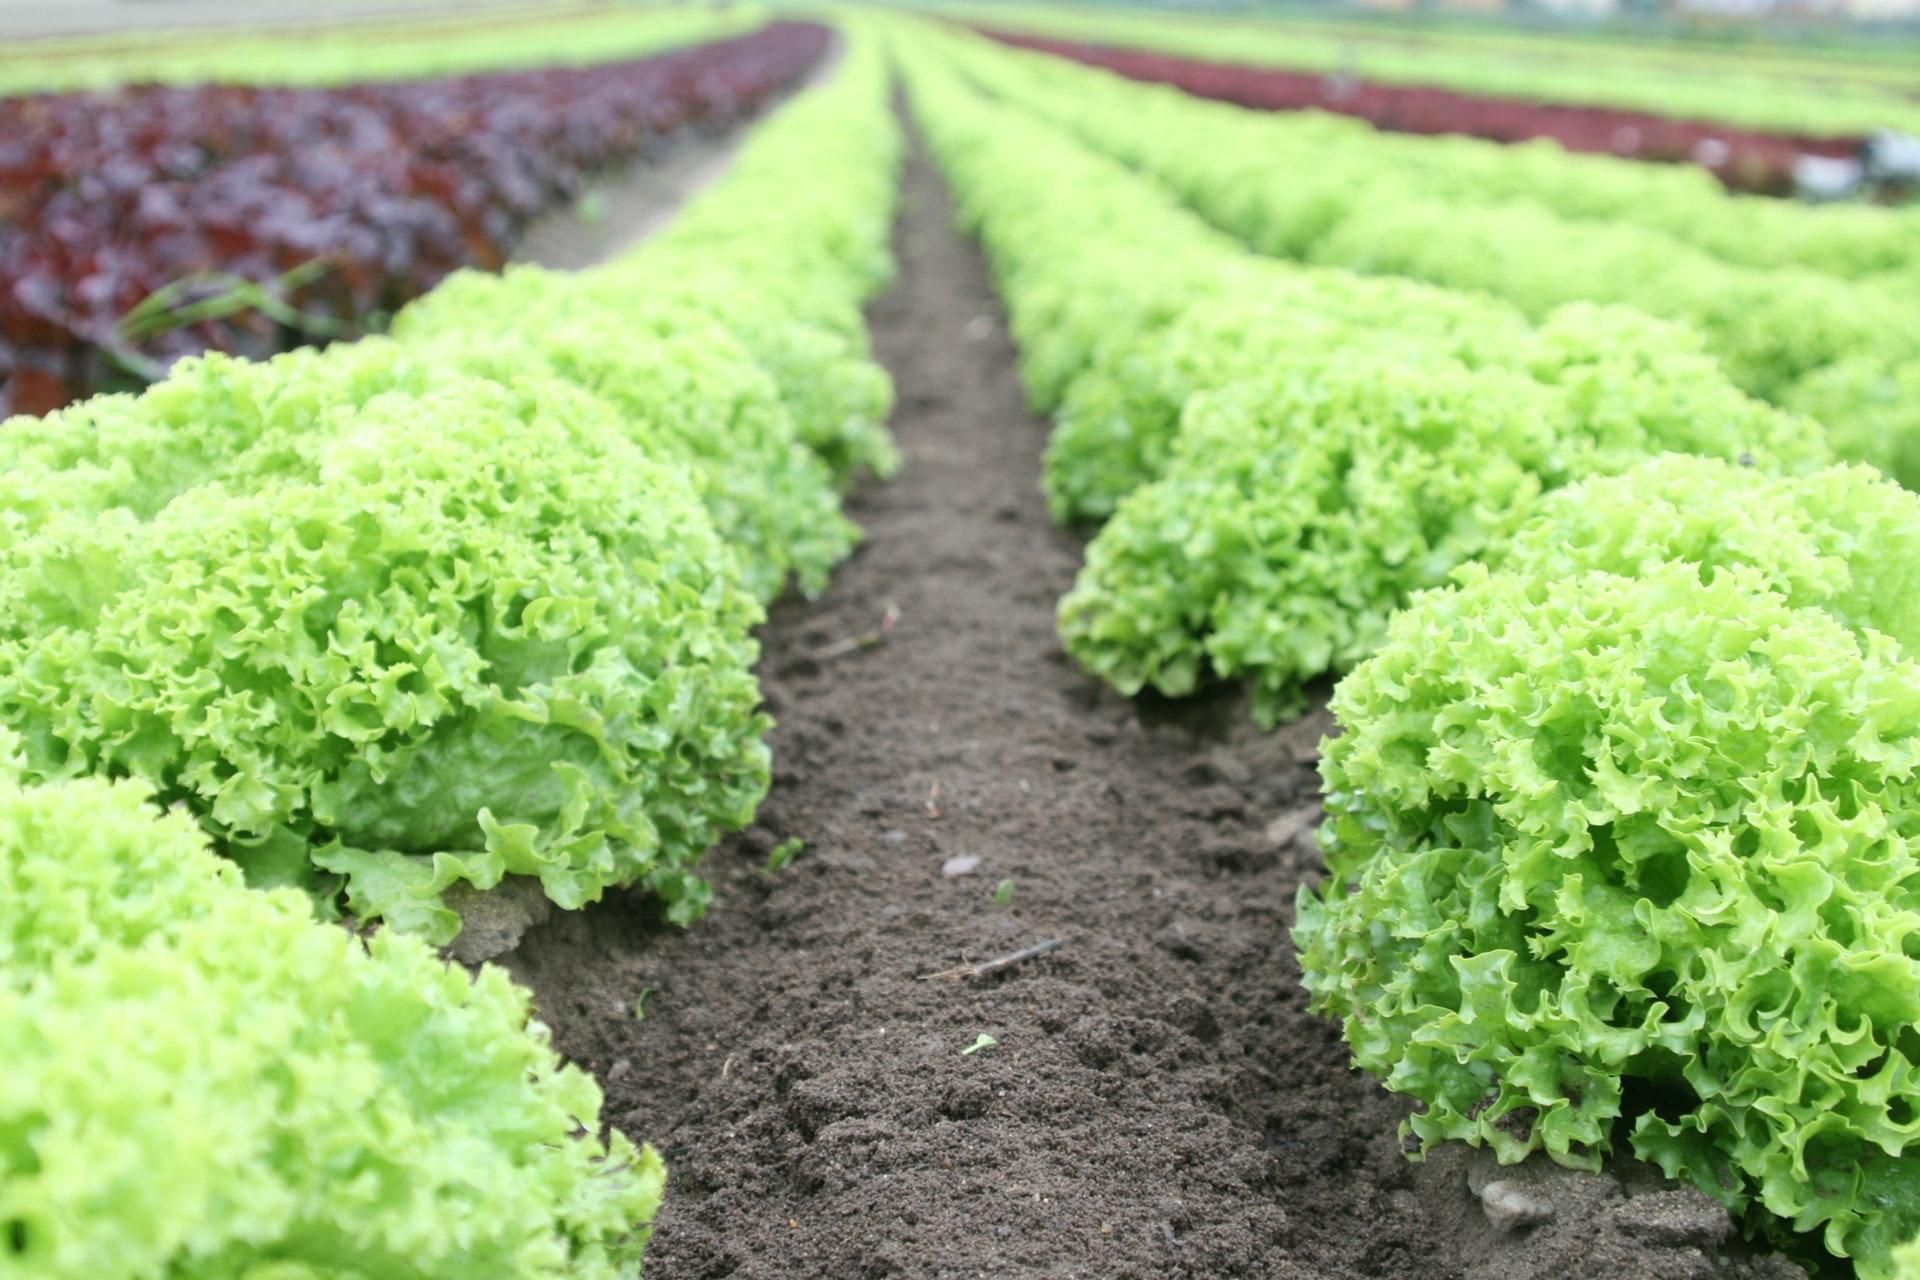 Rows of fresh vegetables in garden.